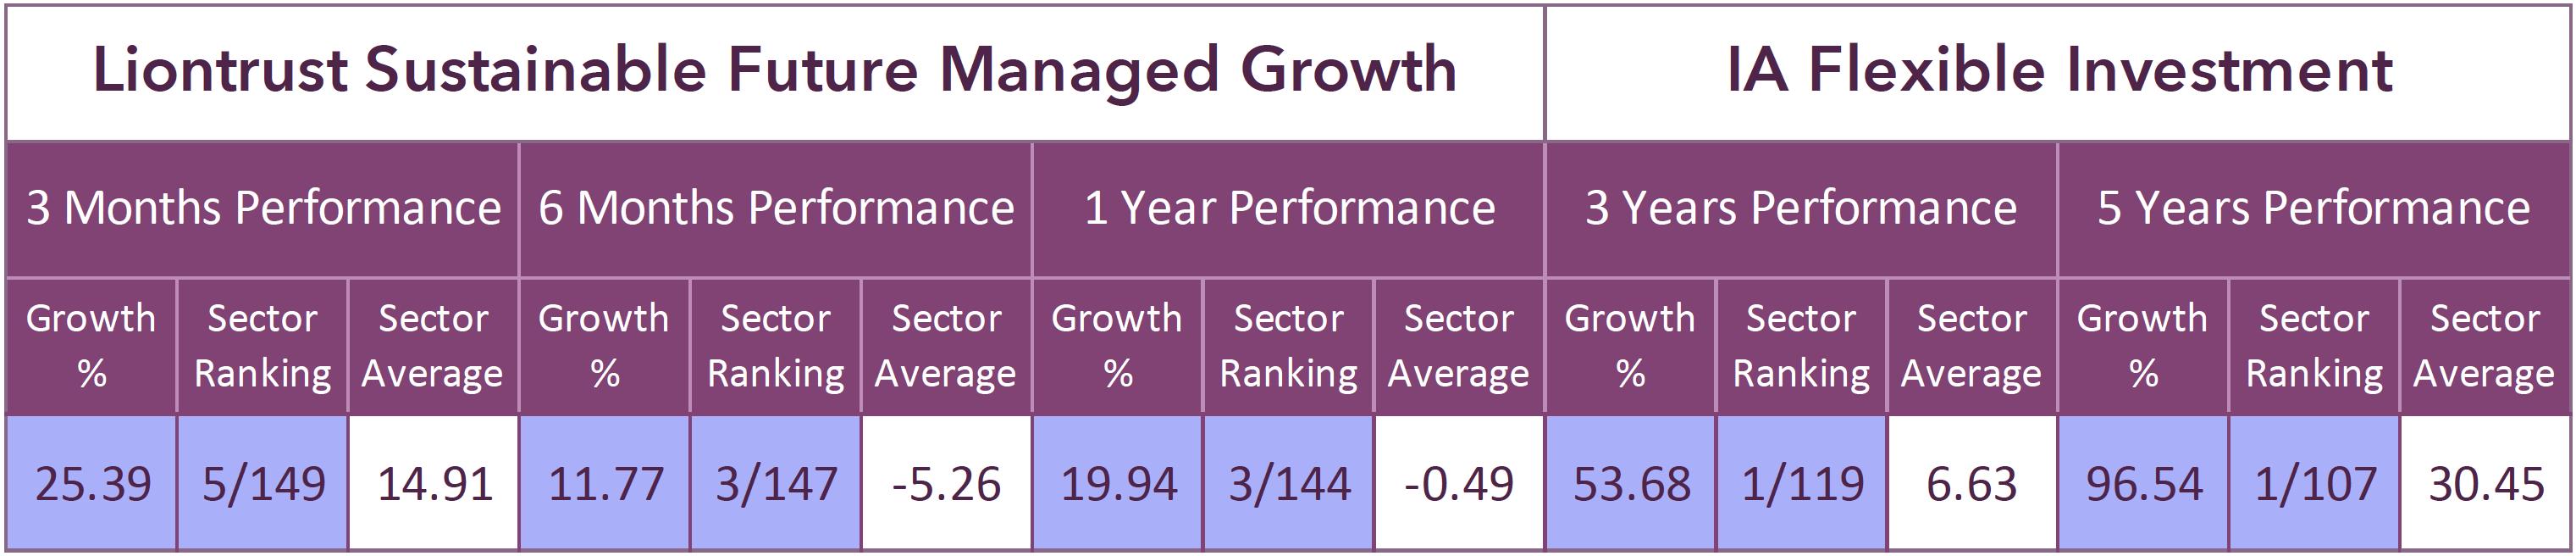 Liontrust Sustainable Future Managed Growth